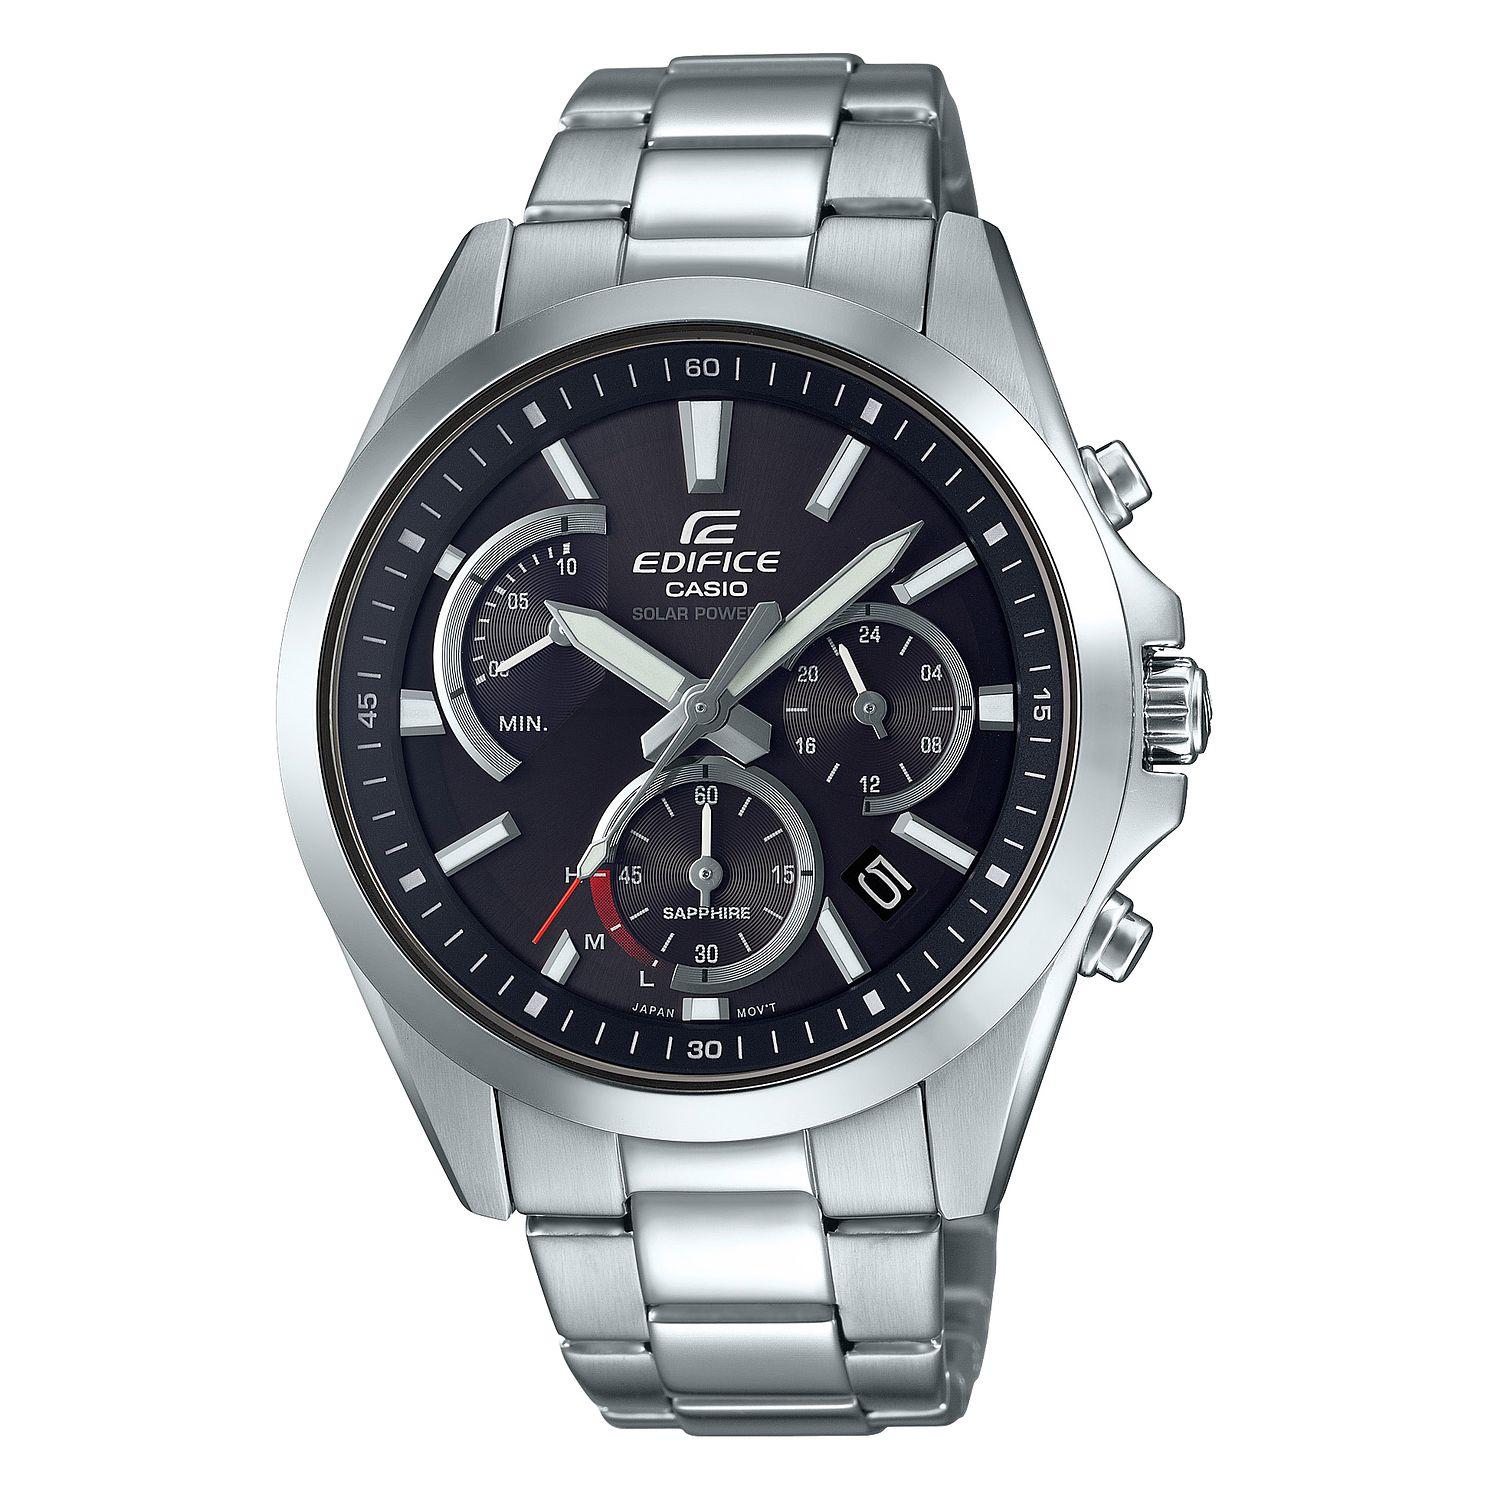 Casio Edifice Solar Sapphire Stainless Steel Bracelet Watch £76.50 at H.Samuel